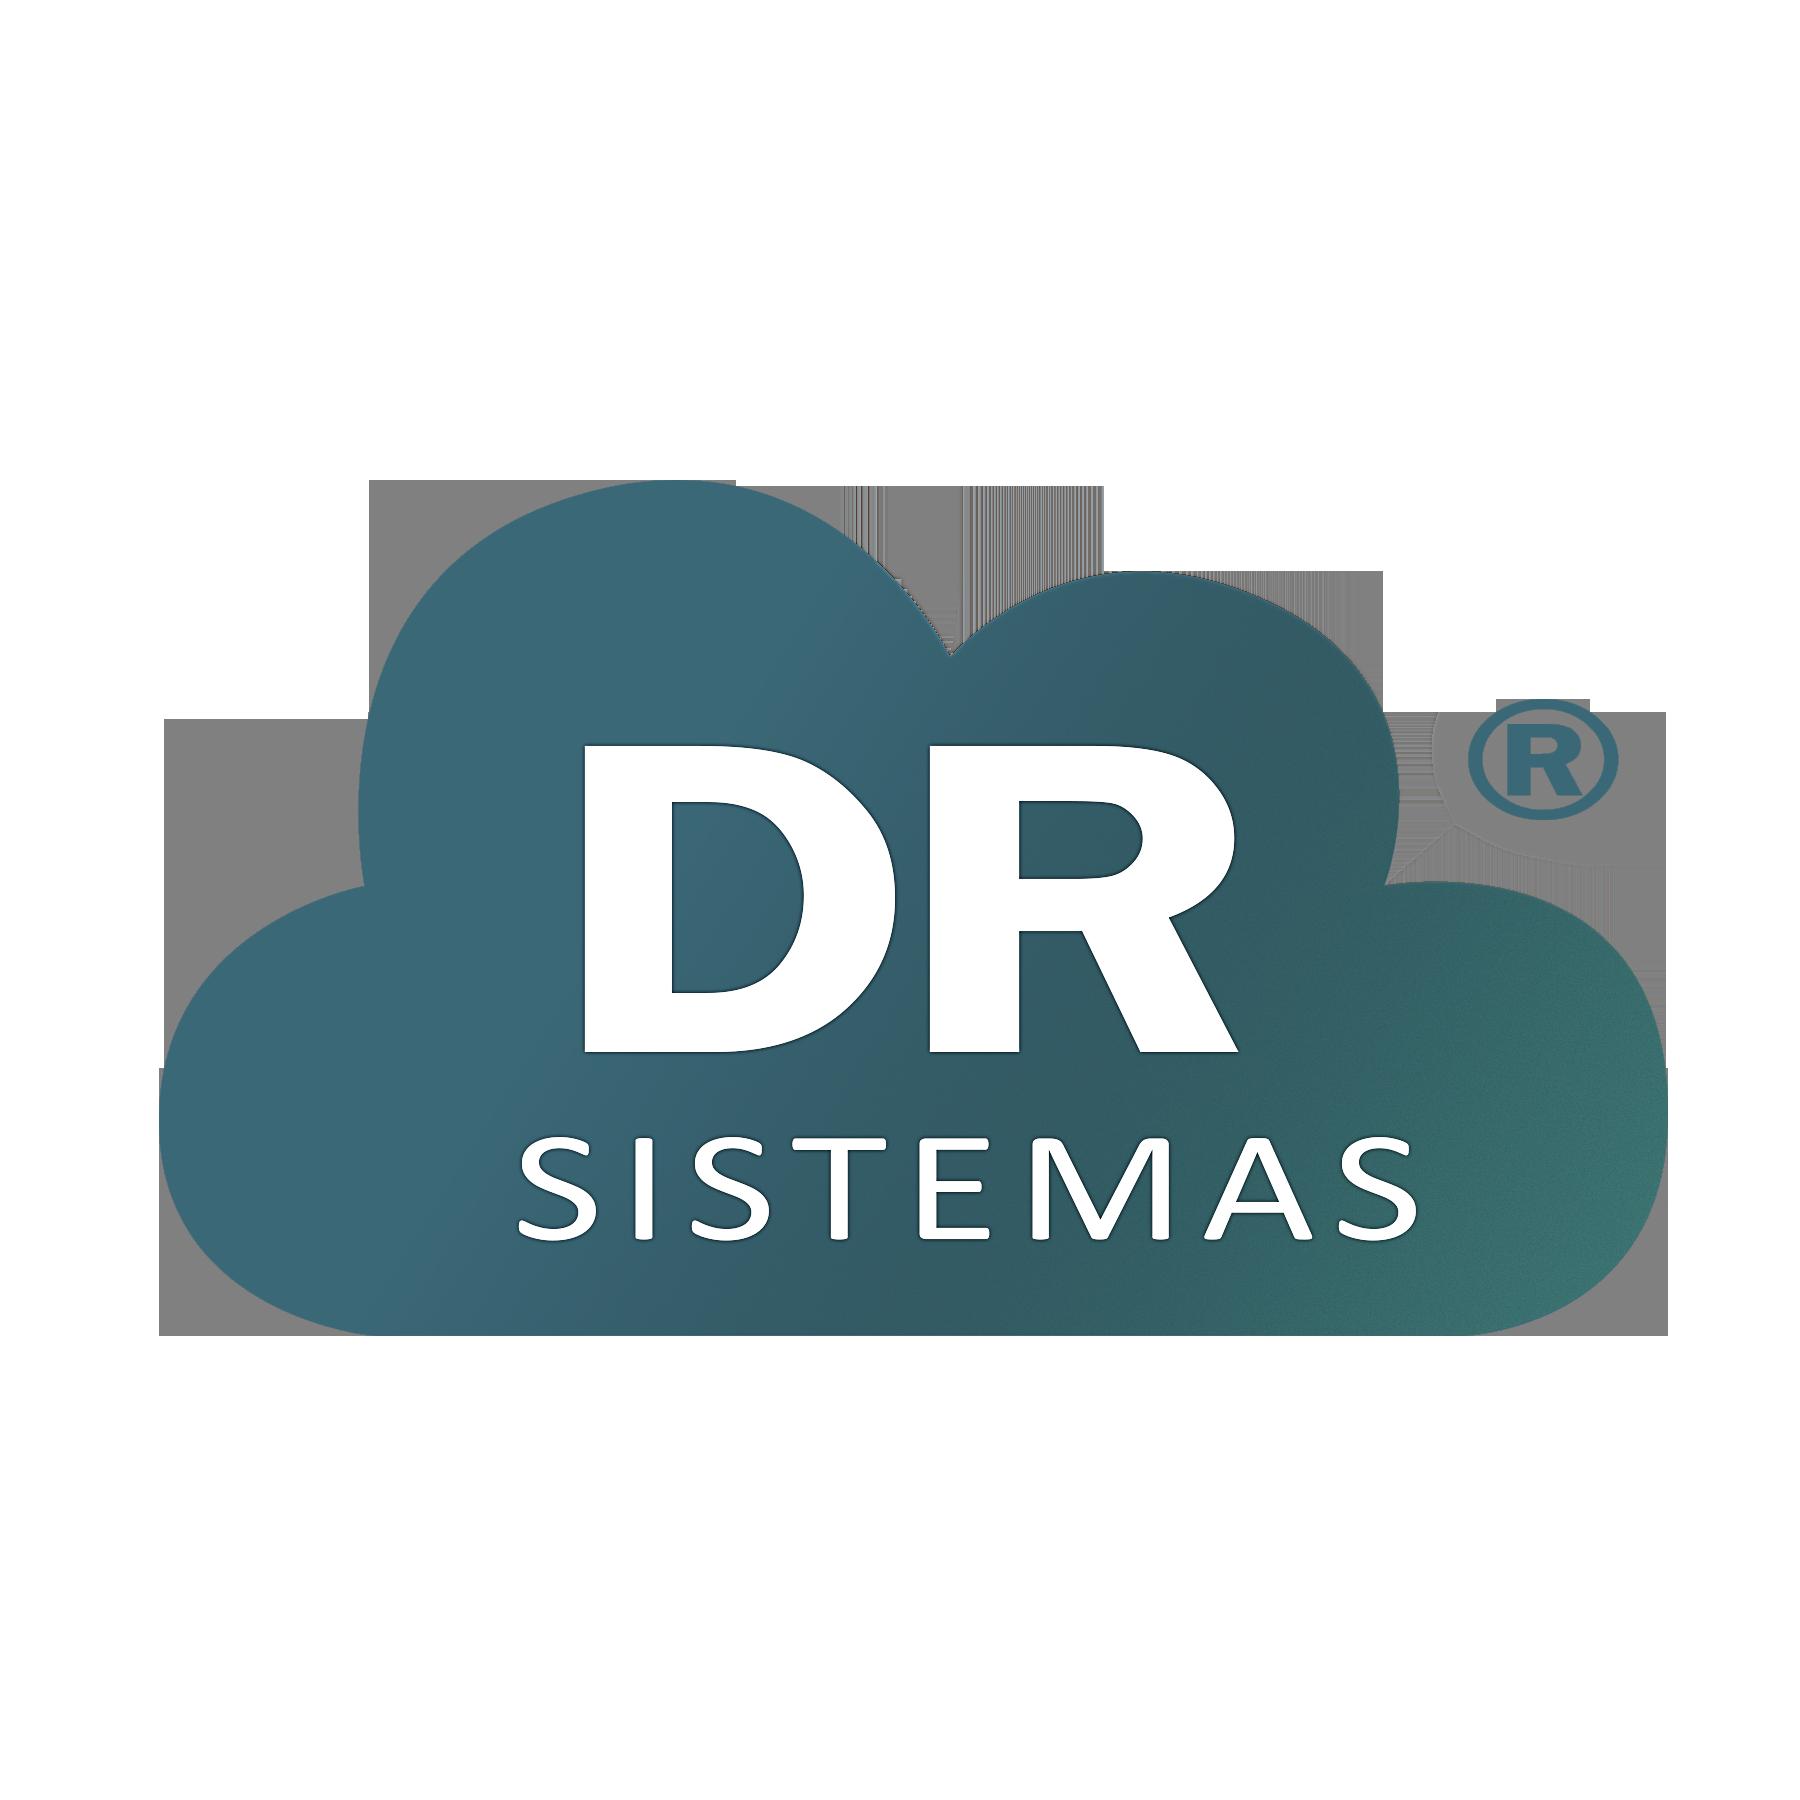 DR Sistemas